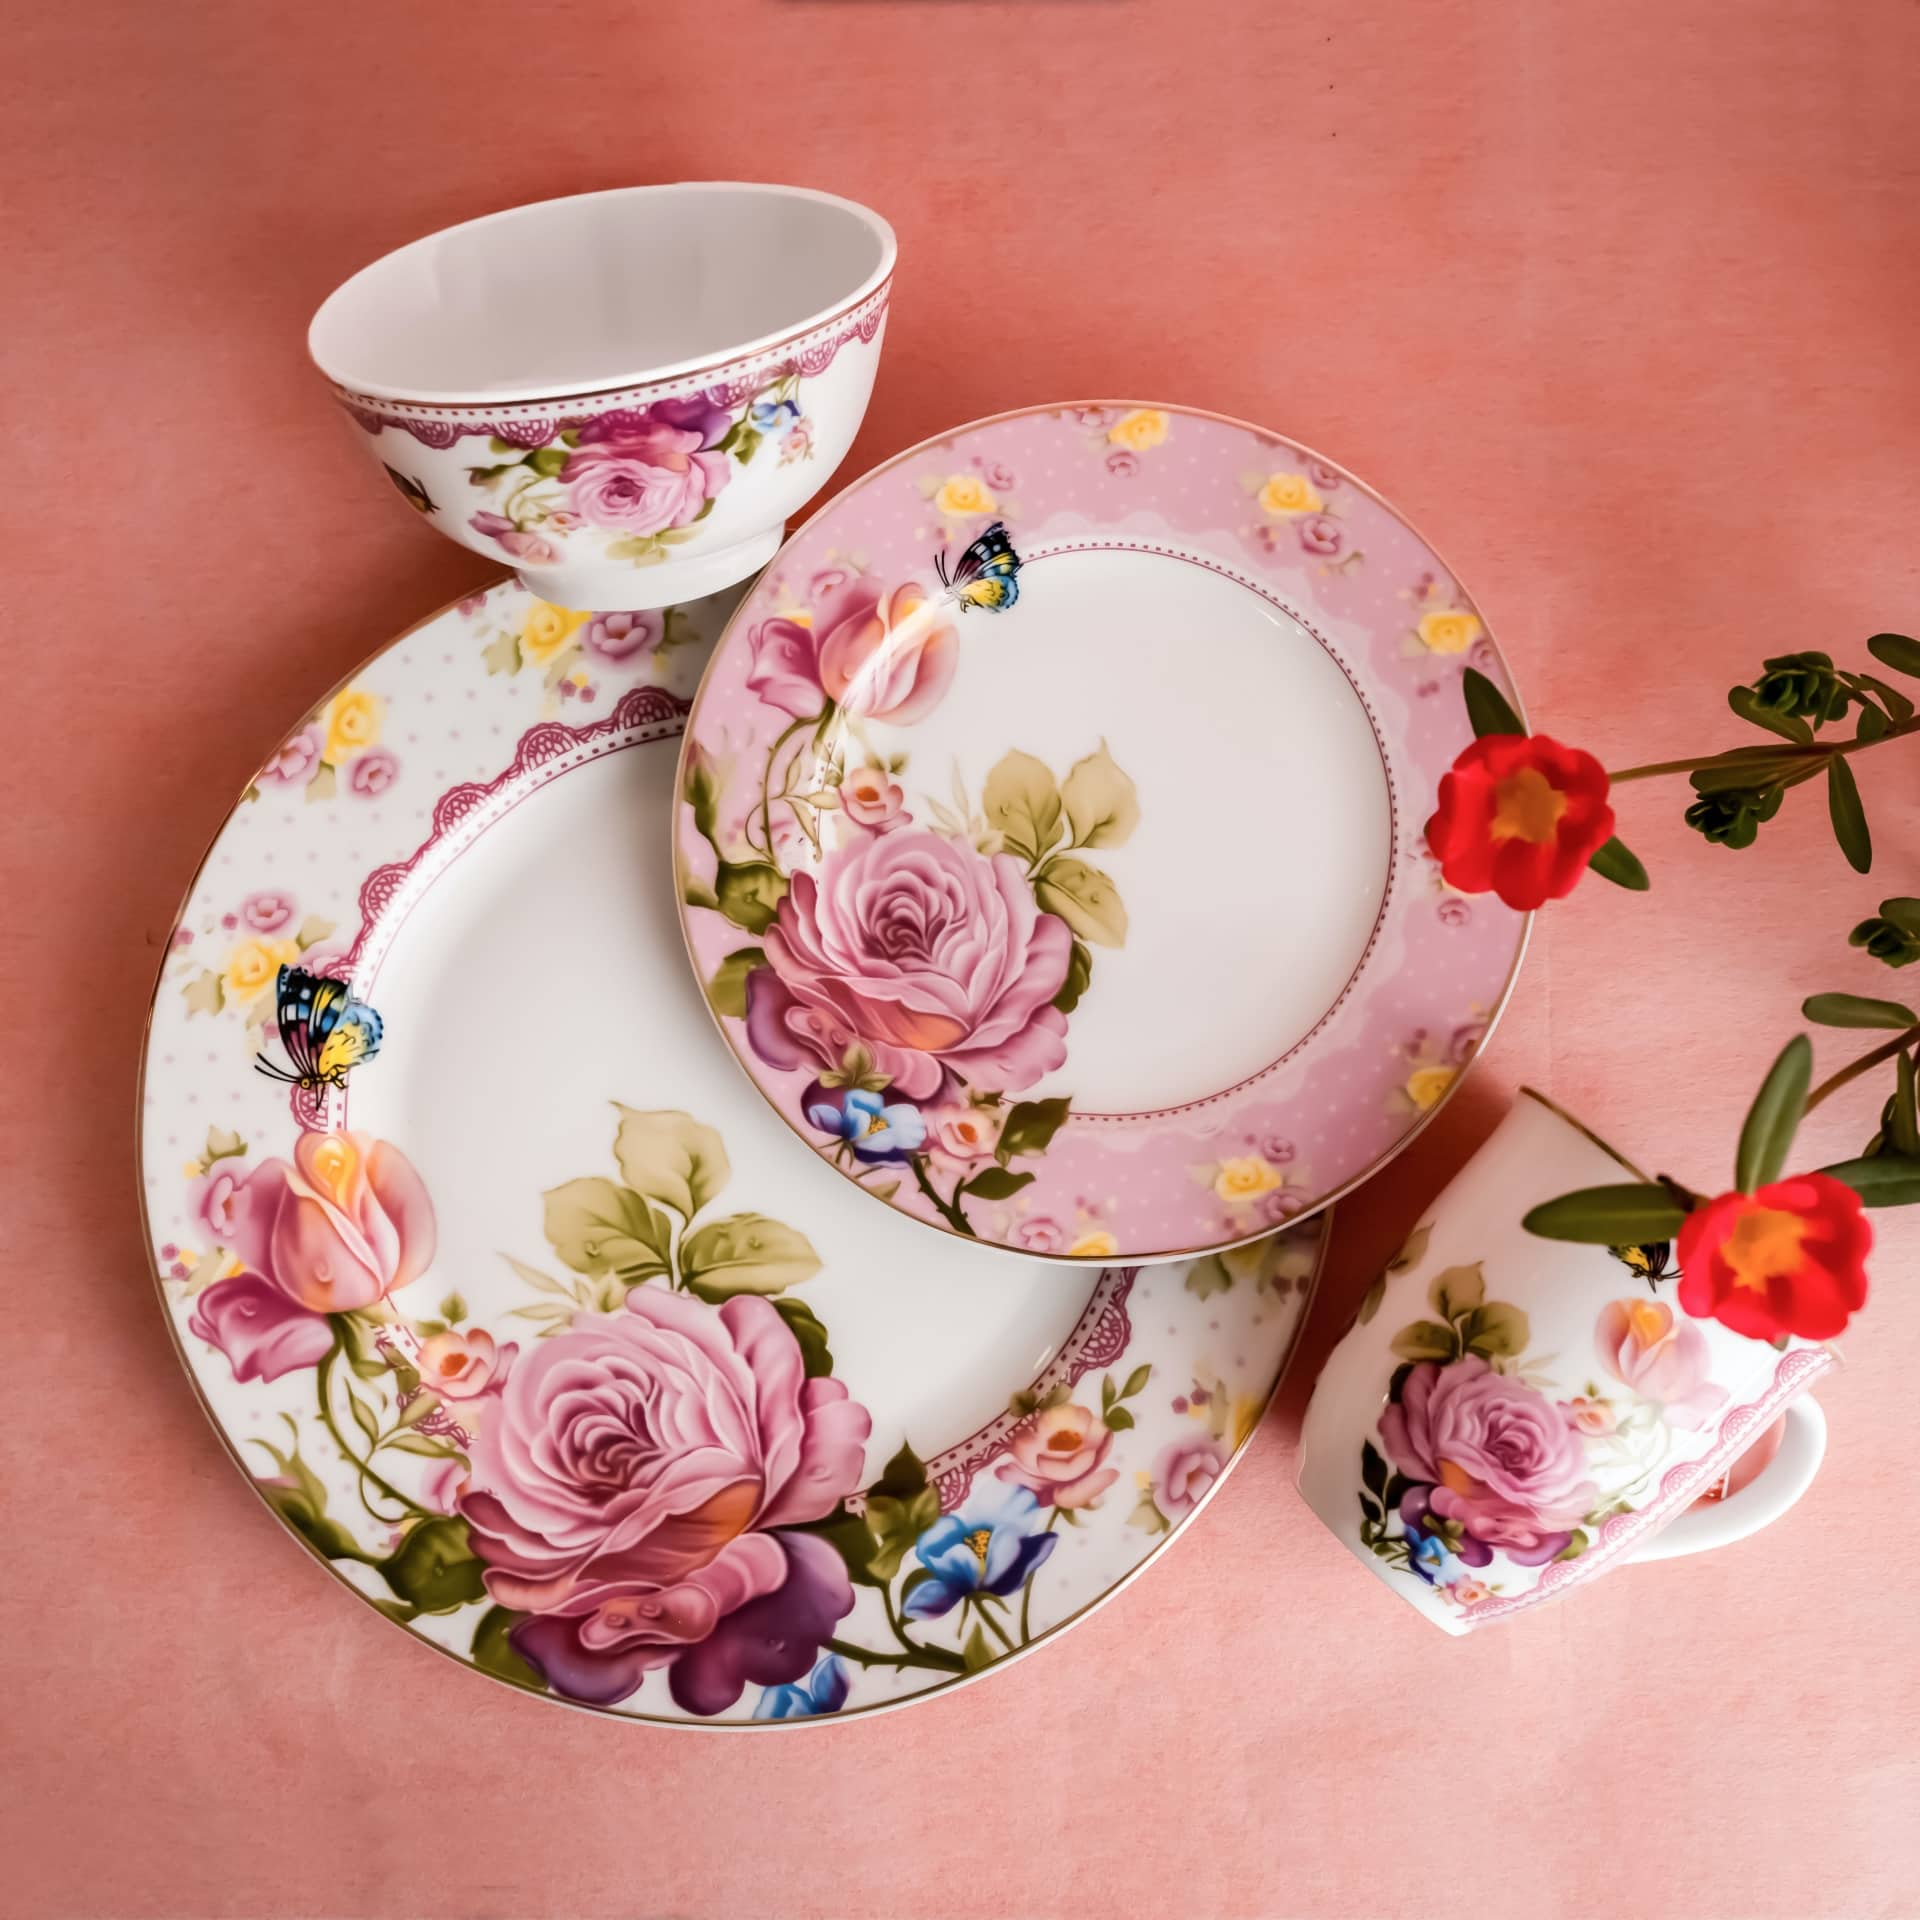 Viola Paeonia Porcelain Dinner Set of 4